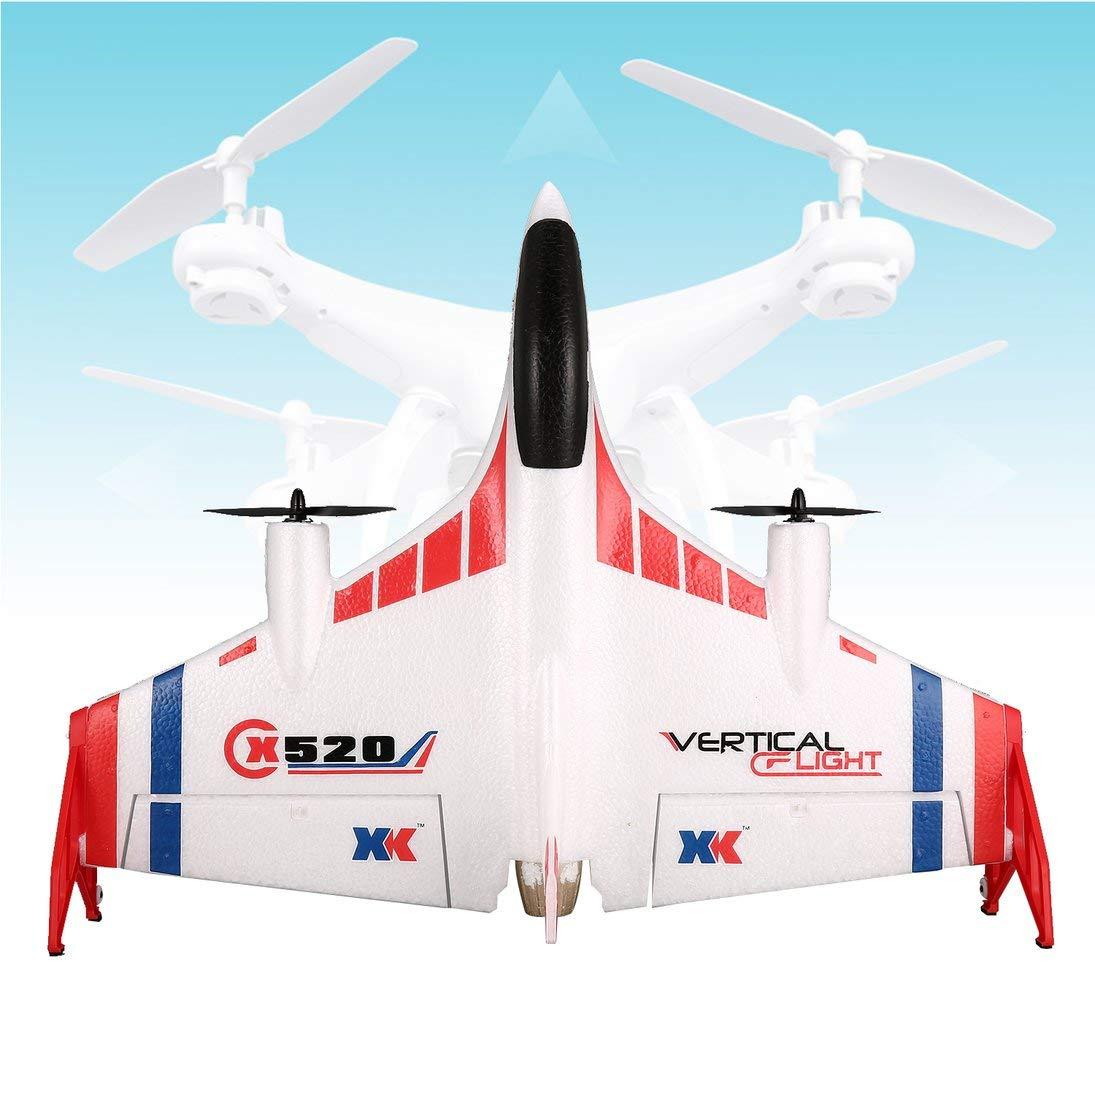 WEIHAN XK X520 6CH 3D 6G Flugzeug VTOL Vertikal Start Land Delta Wing Brushless RC Drohne Fixed Wing mit Modus Schalter 720 FPV Kamera